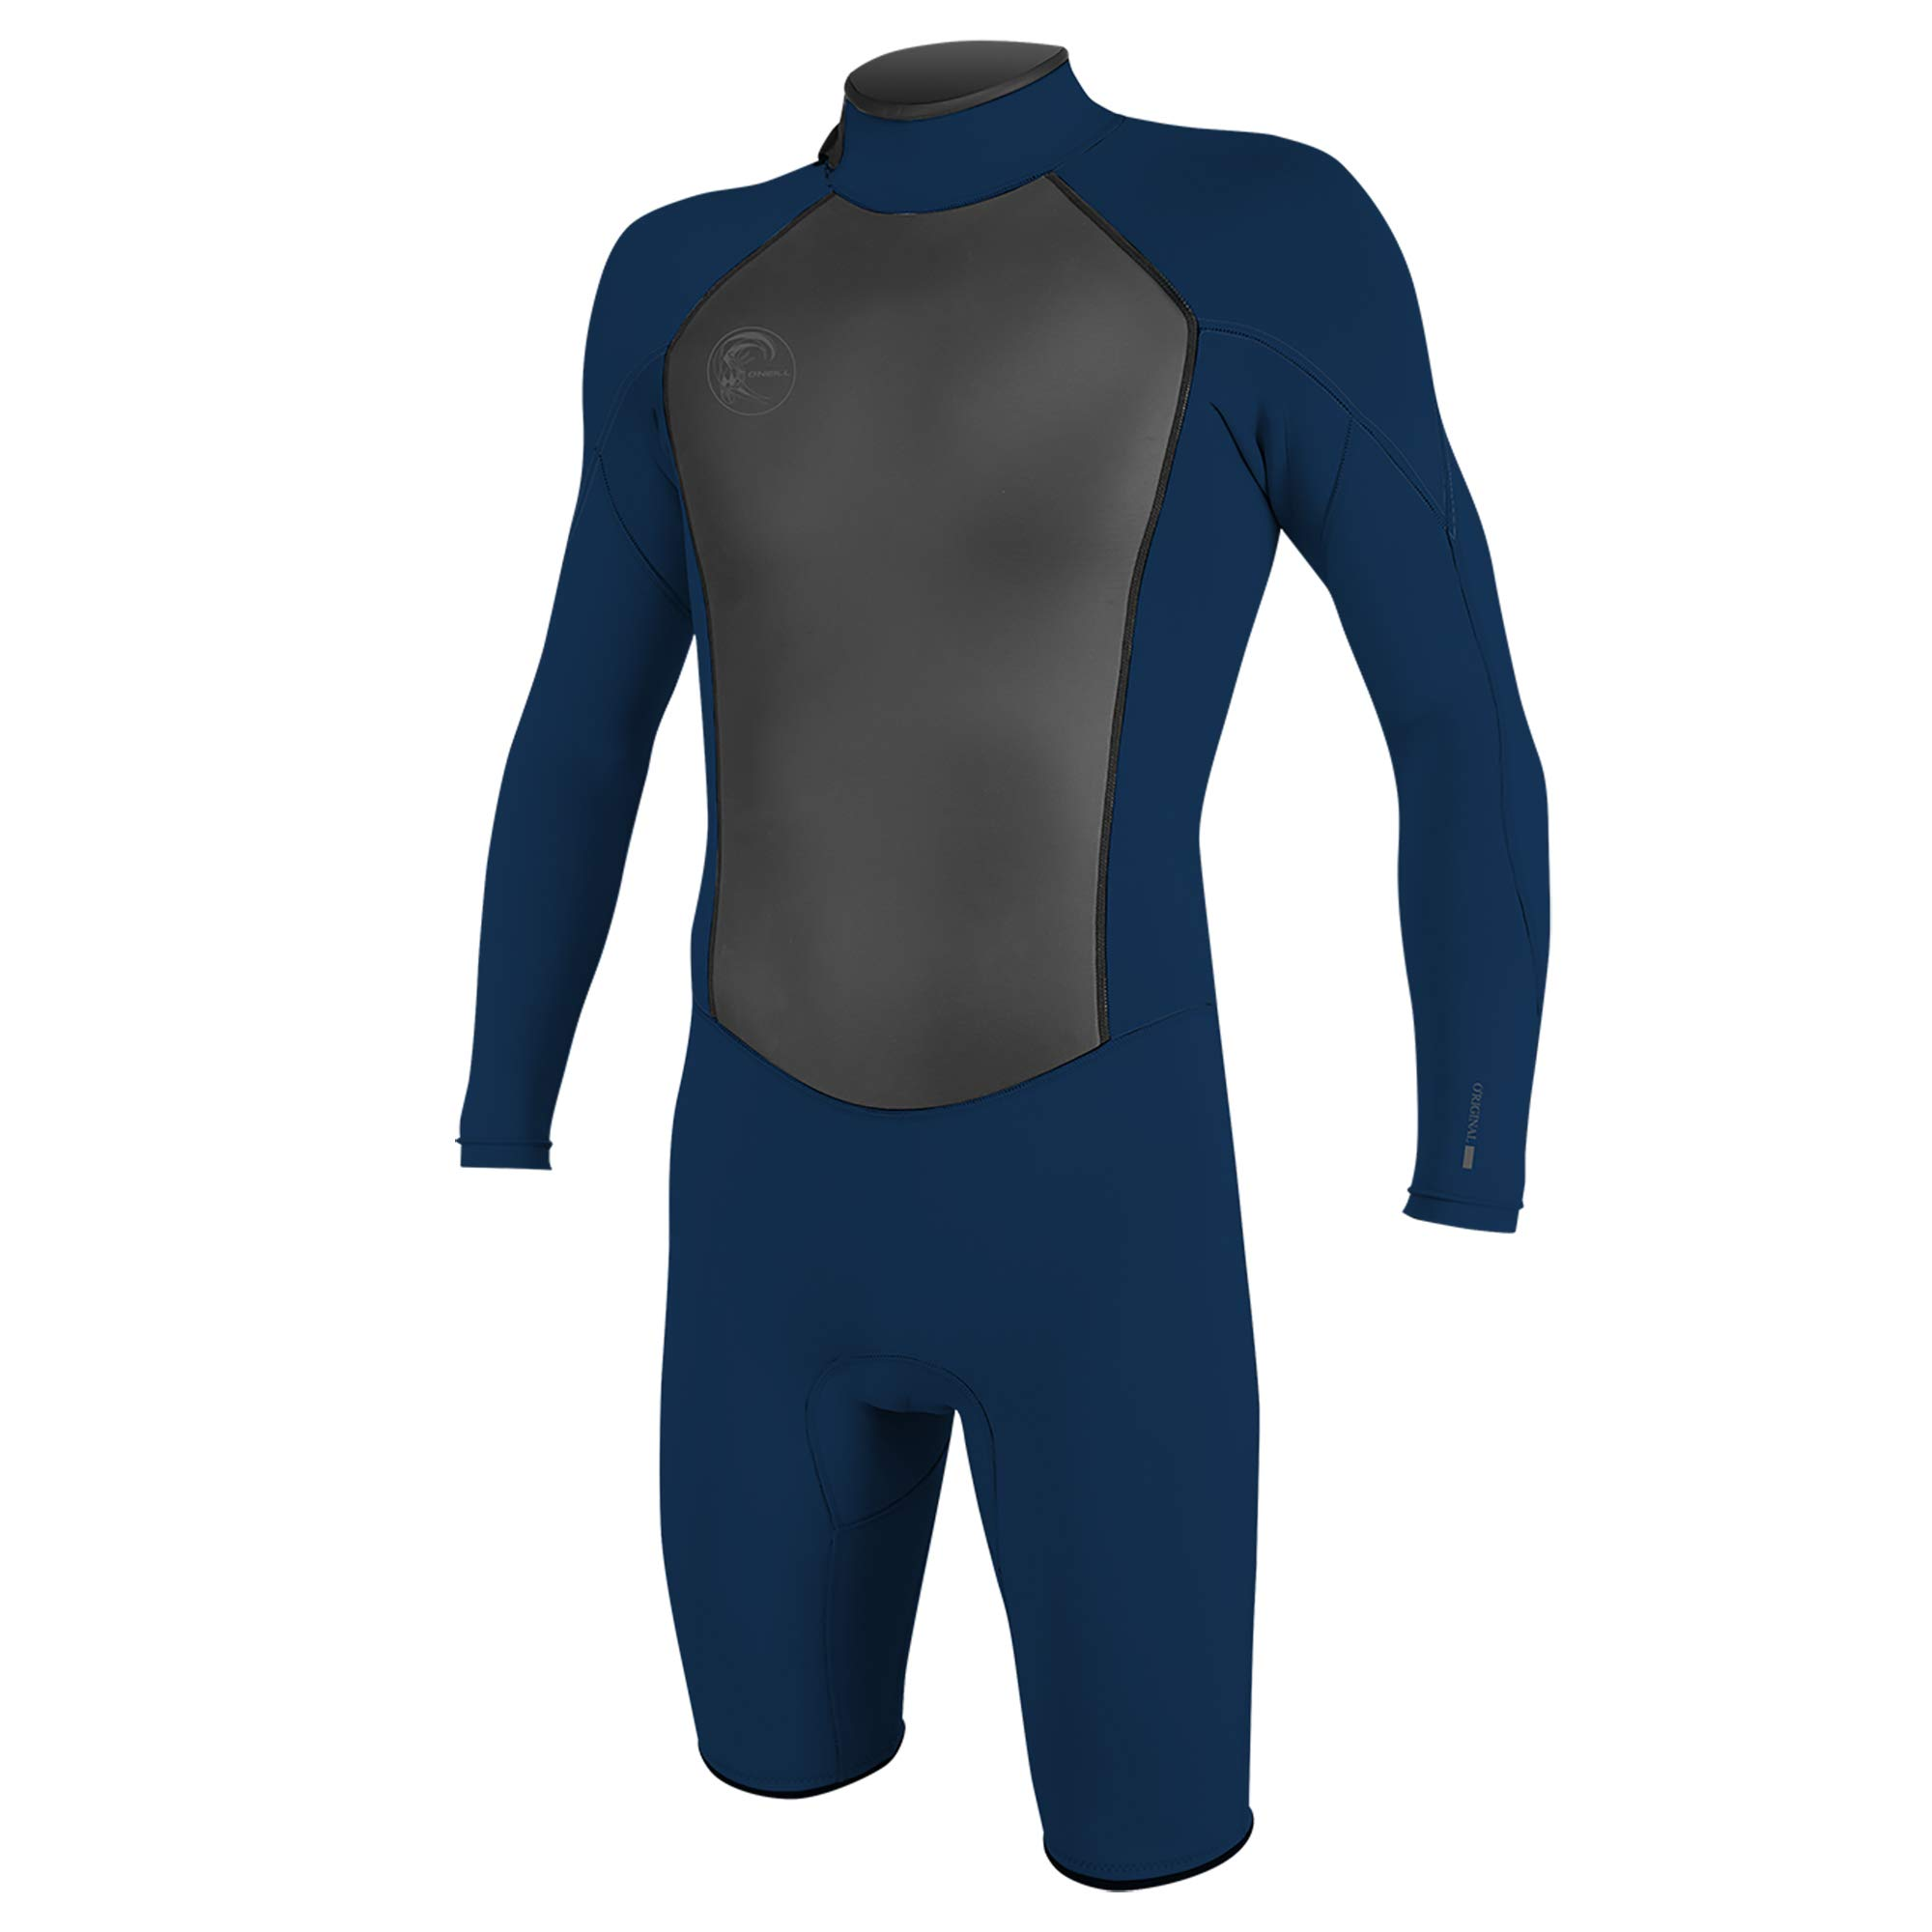 O'Neill Wetsuits Men's Original 2mm Back Zip Long Sleeve Spring Wetsuit, Abyss, Medium